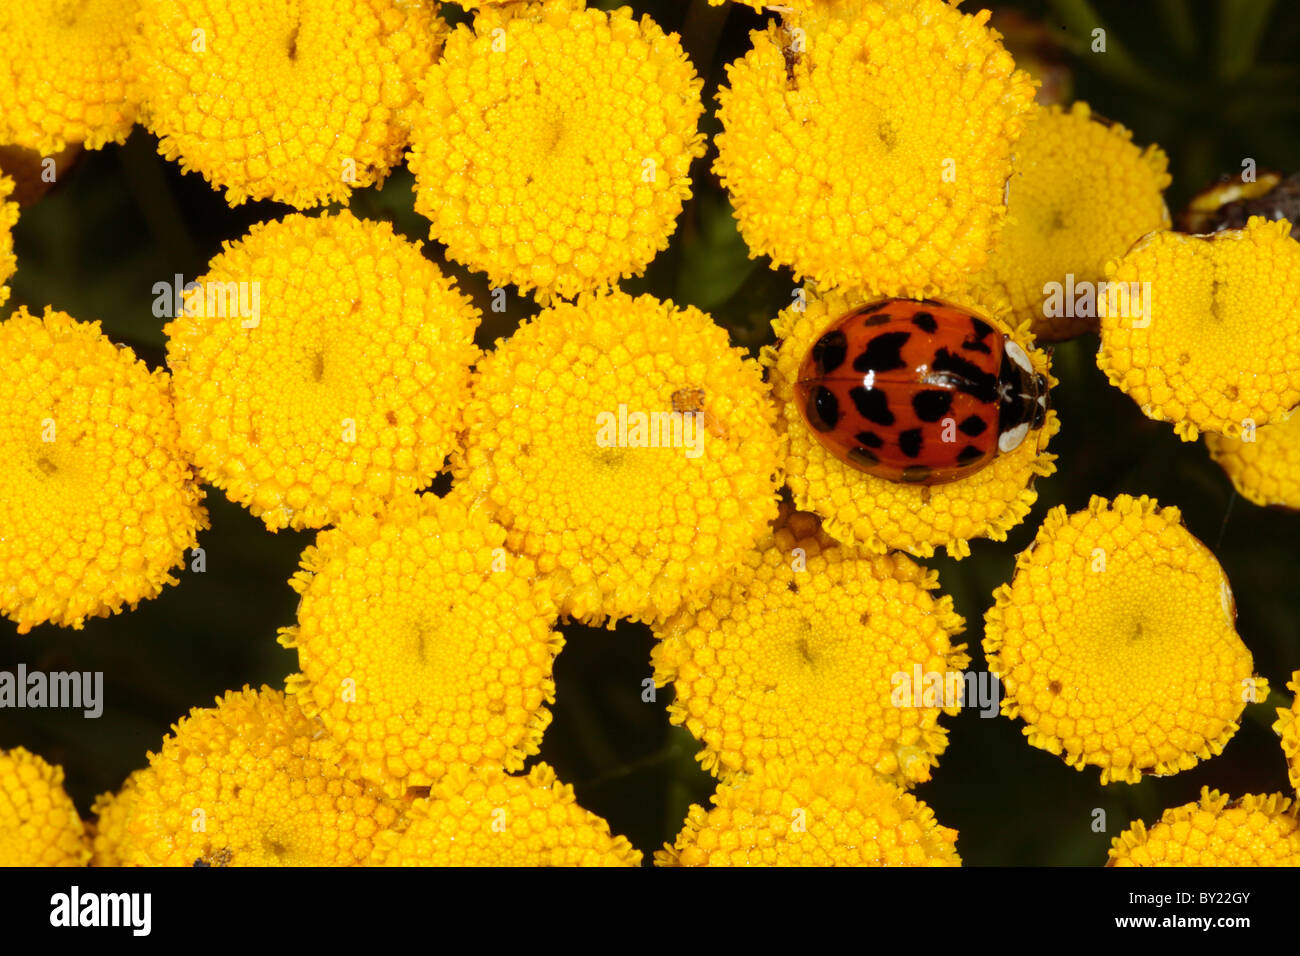 Harlequin Ladybird (Harmonia axyridis) on wild Tansy, introduced pest species. Powys, Wales. - Stock Image